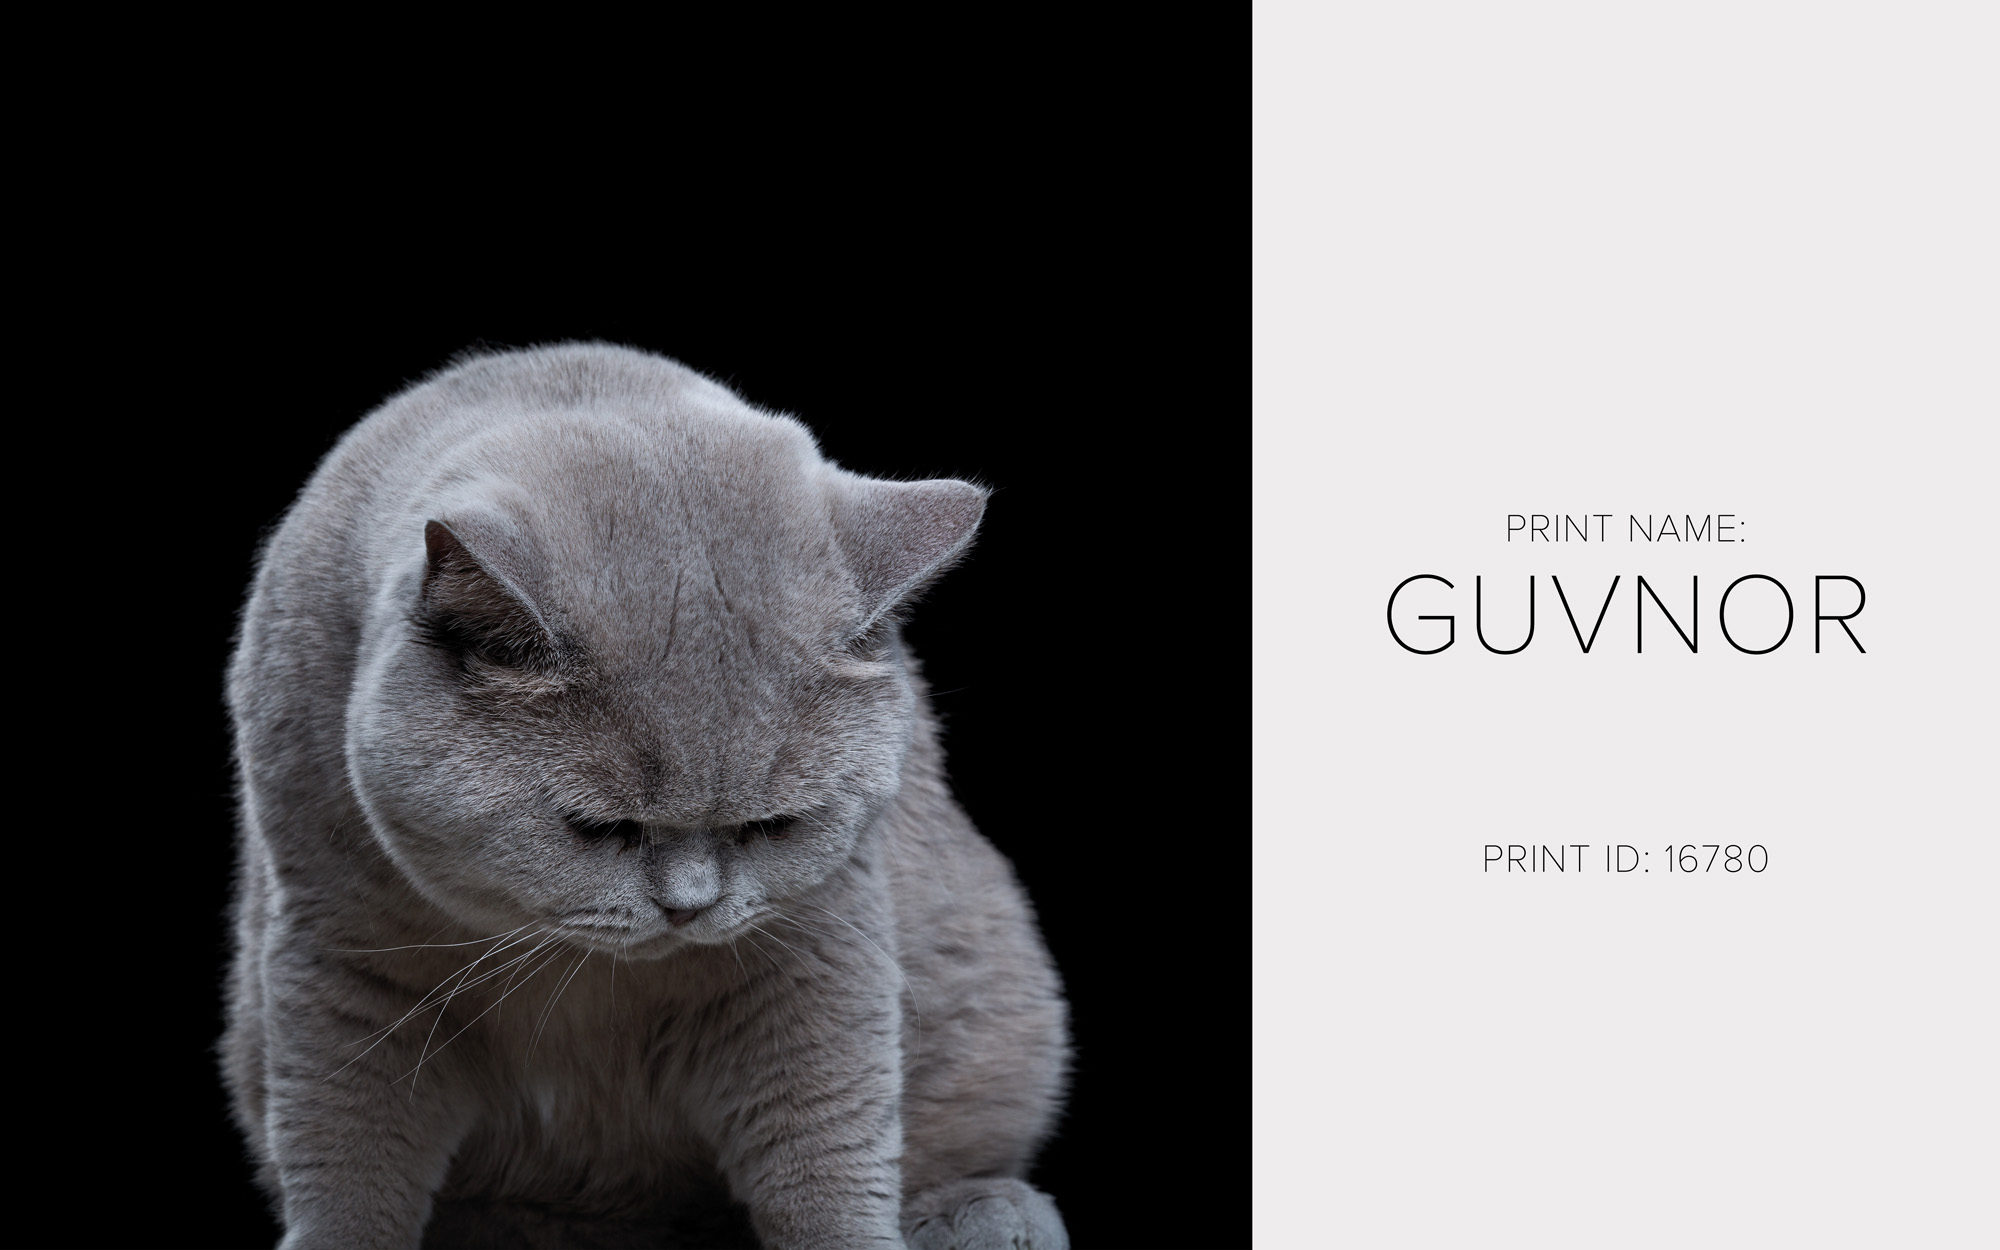 Guvnor_Thumb.jpg